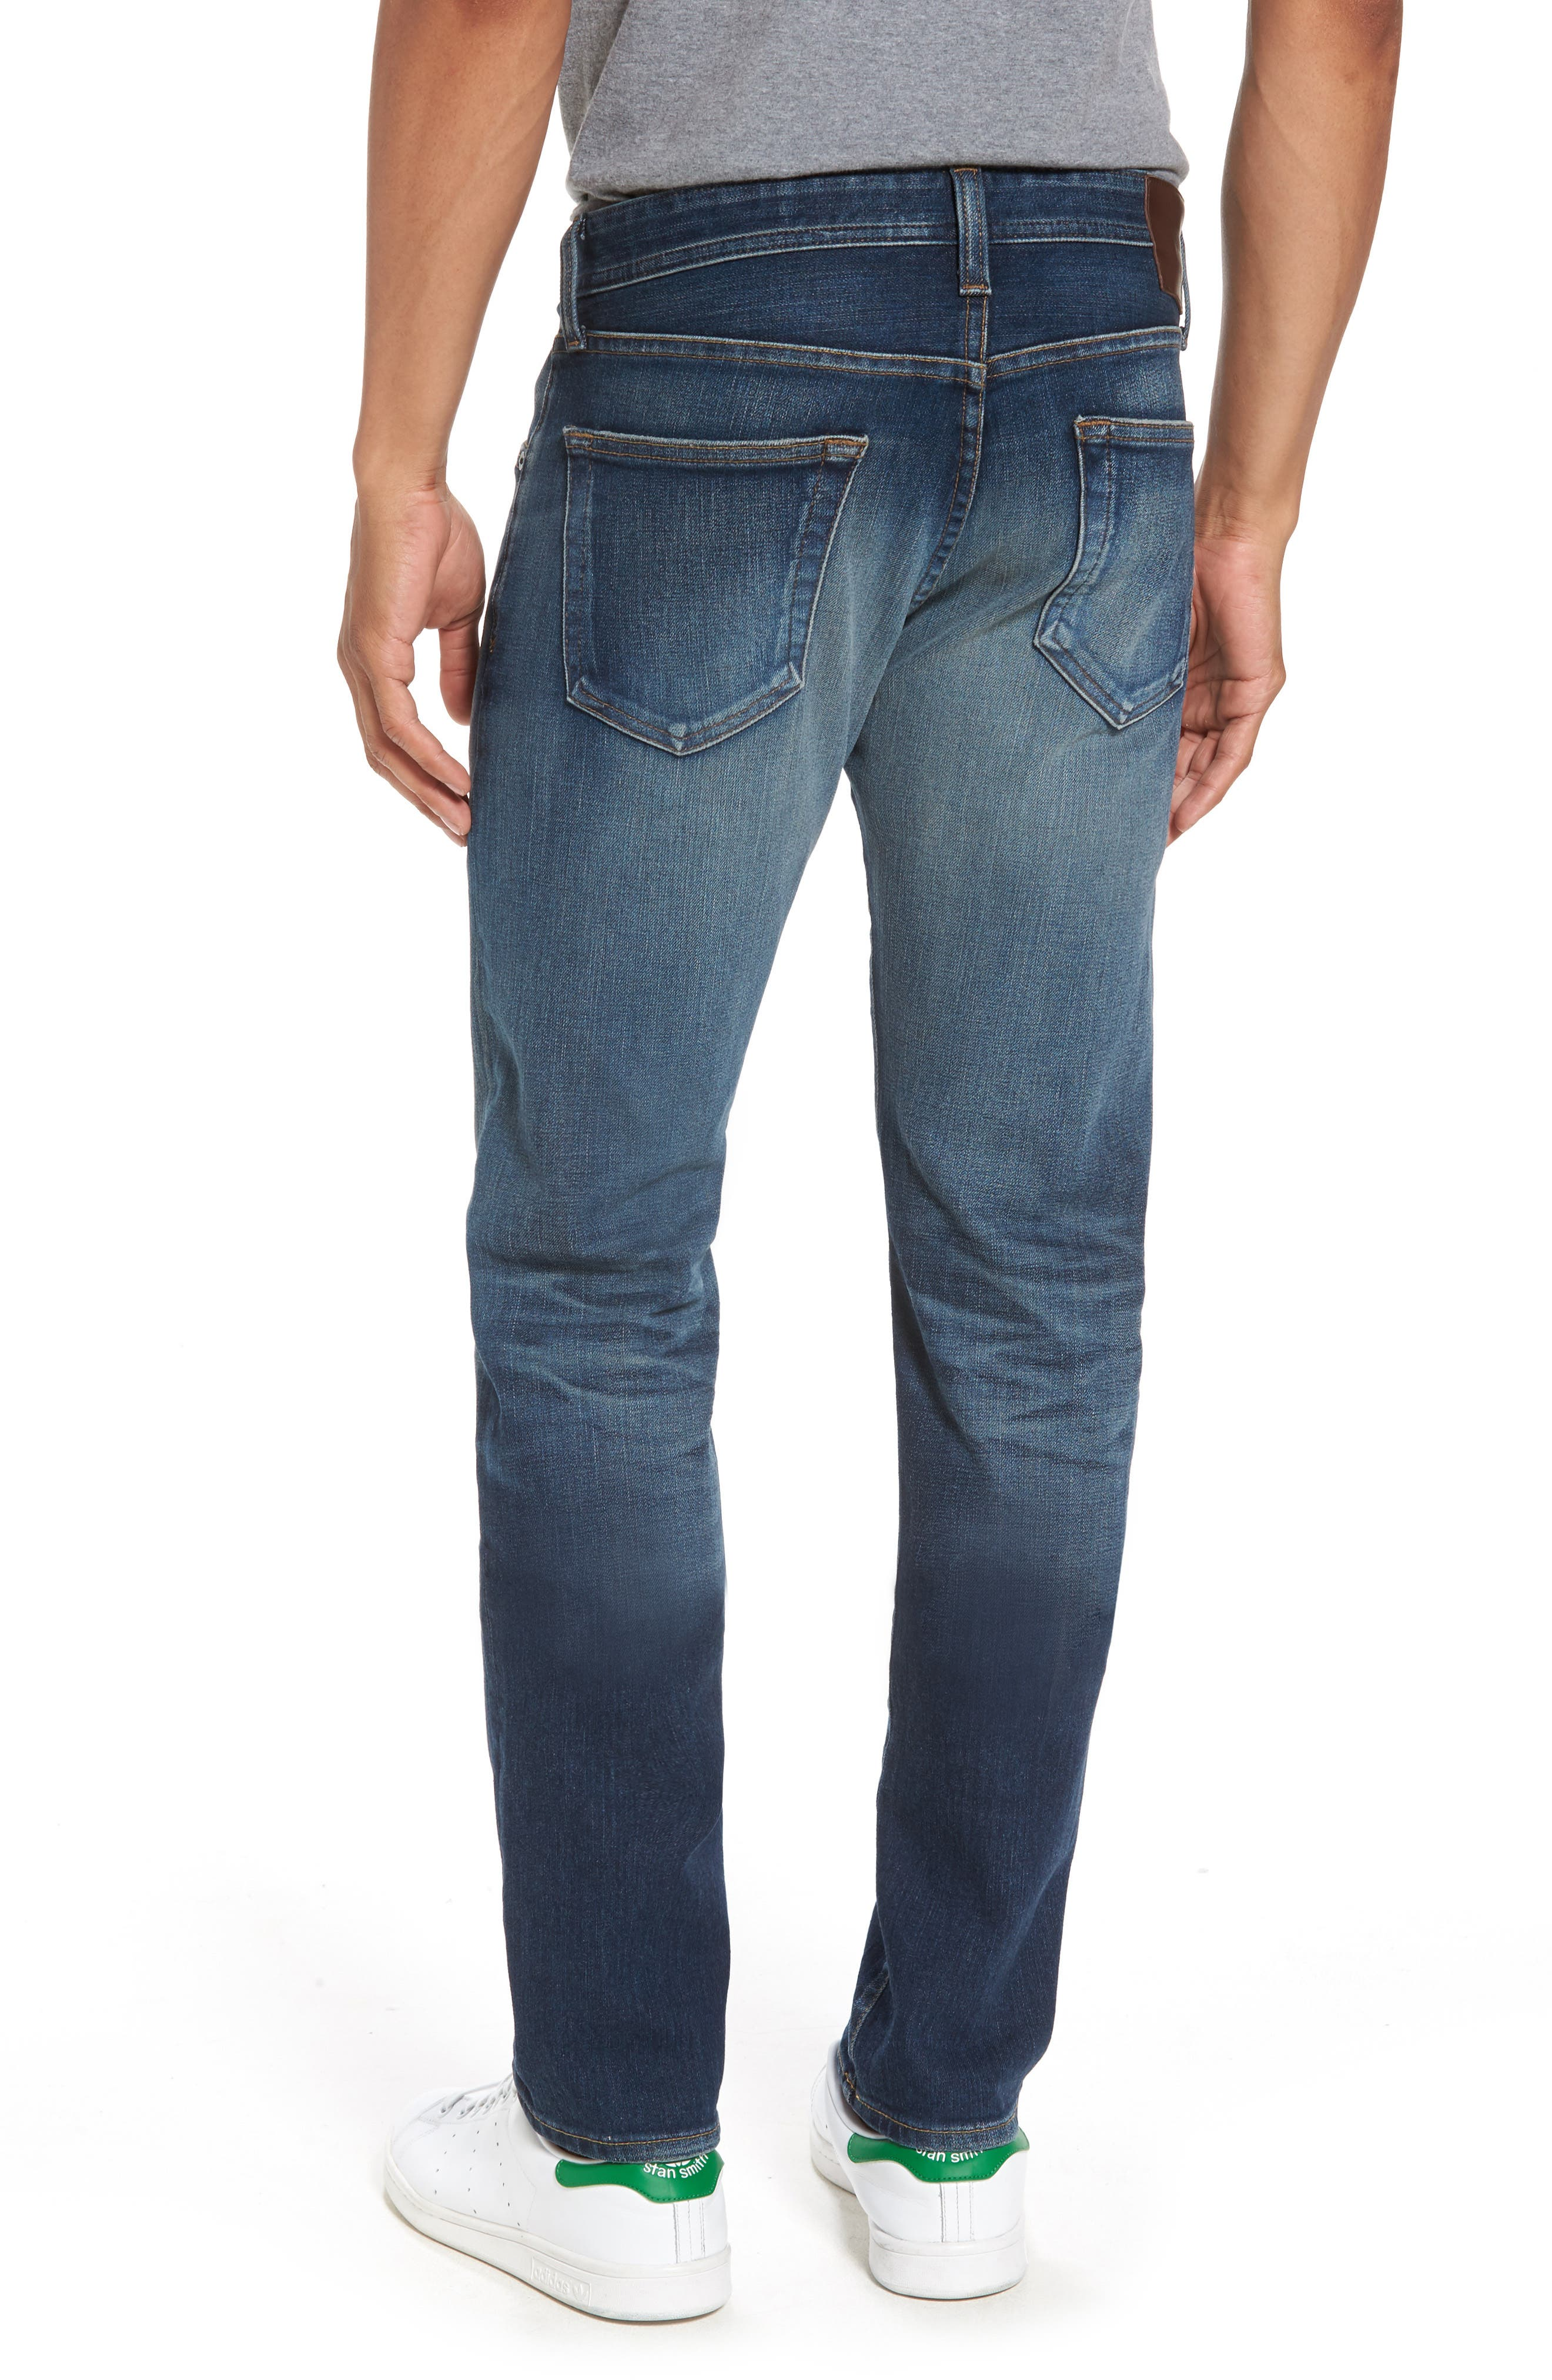 Tellis Slim Fit Jeans,                             Alternate thumbnail 2, color,                             496